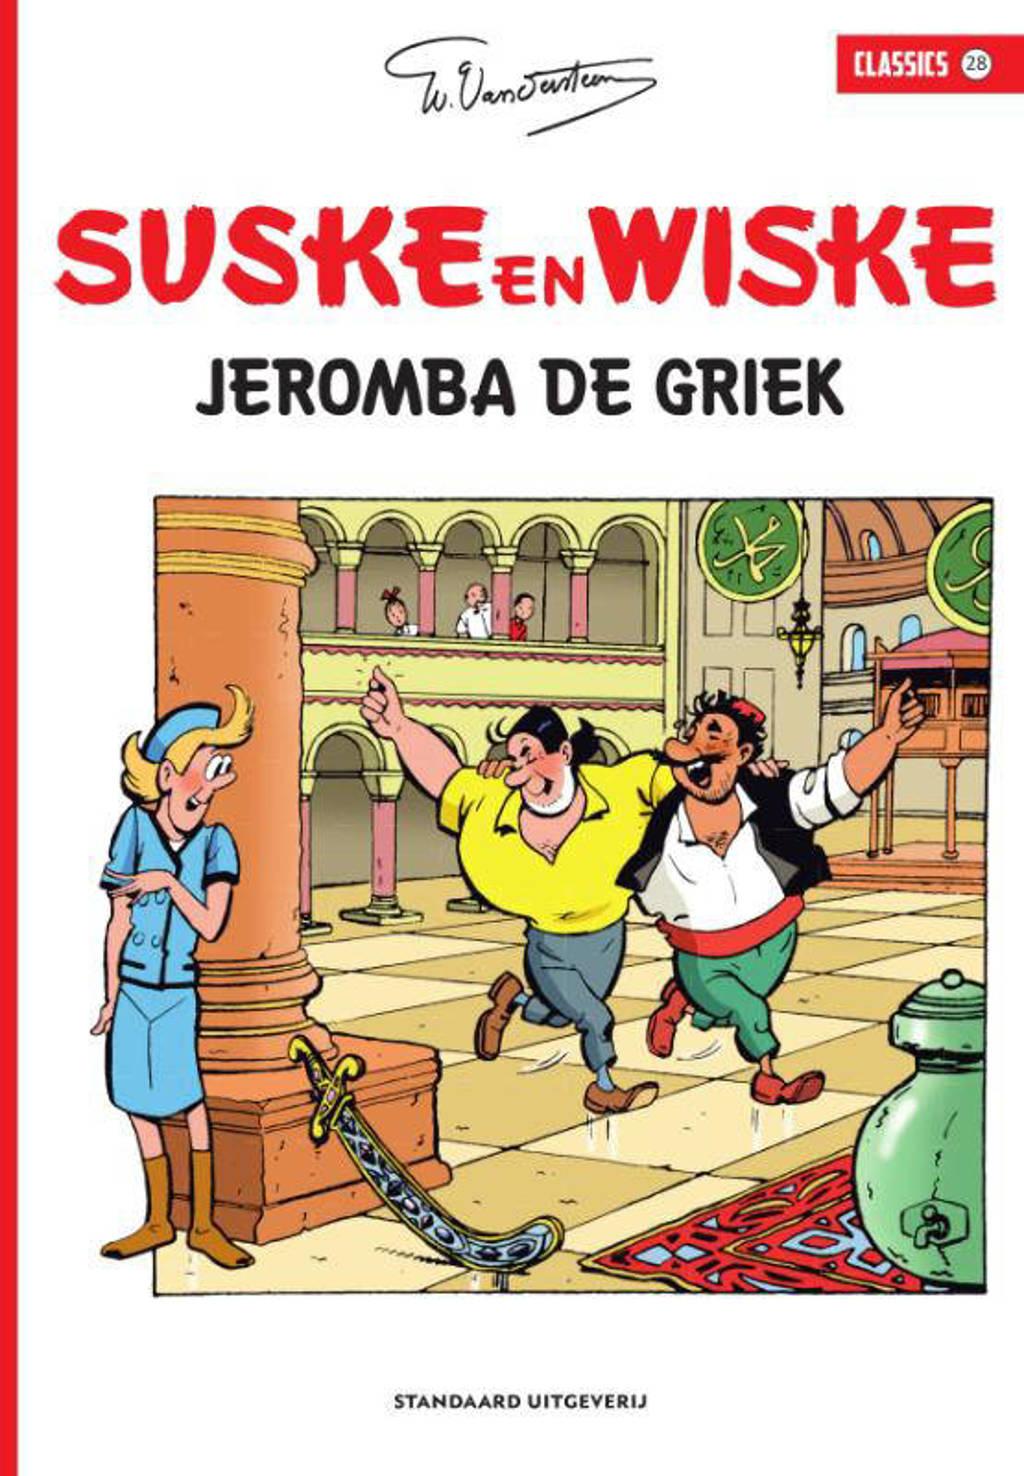 Suske en Wiske Classics: Jeromba de Griek - Willy Vandersteen